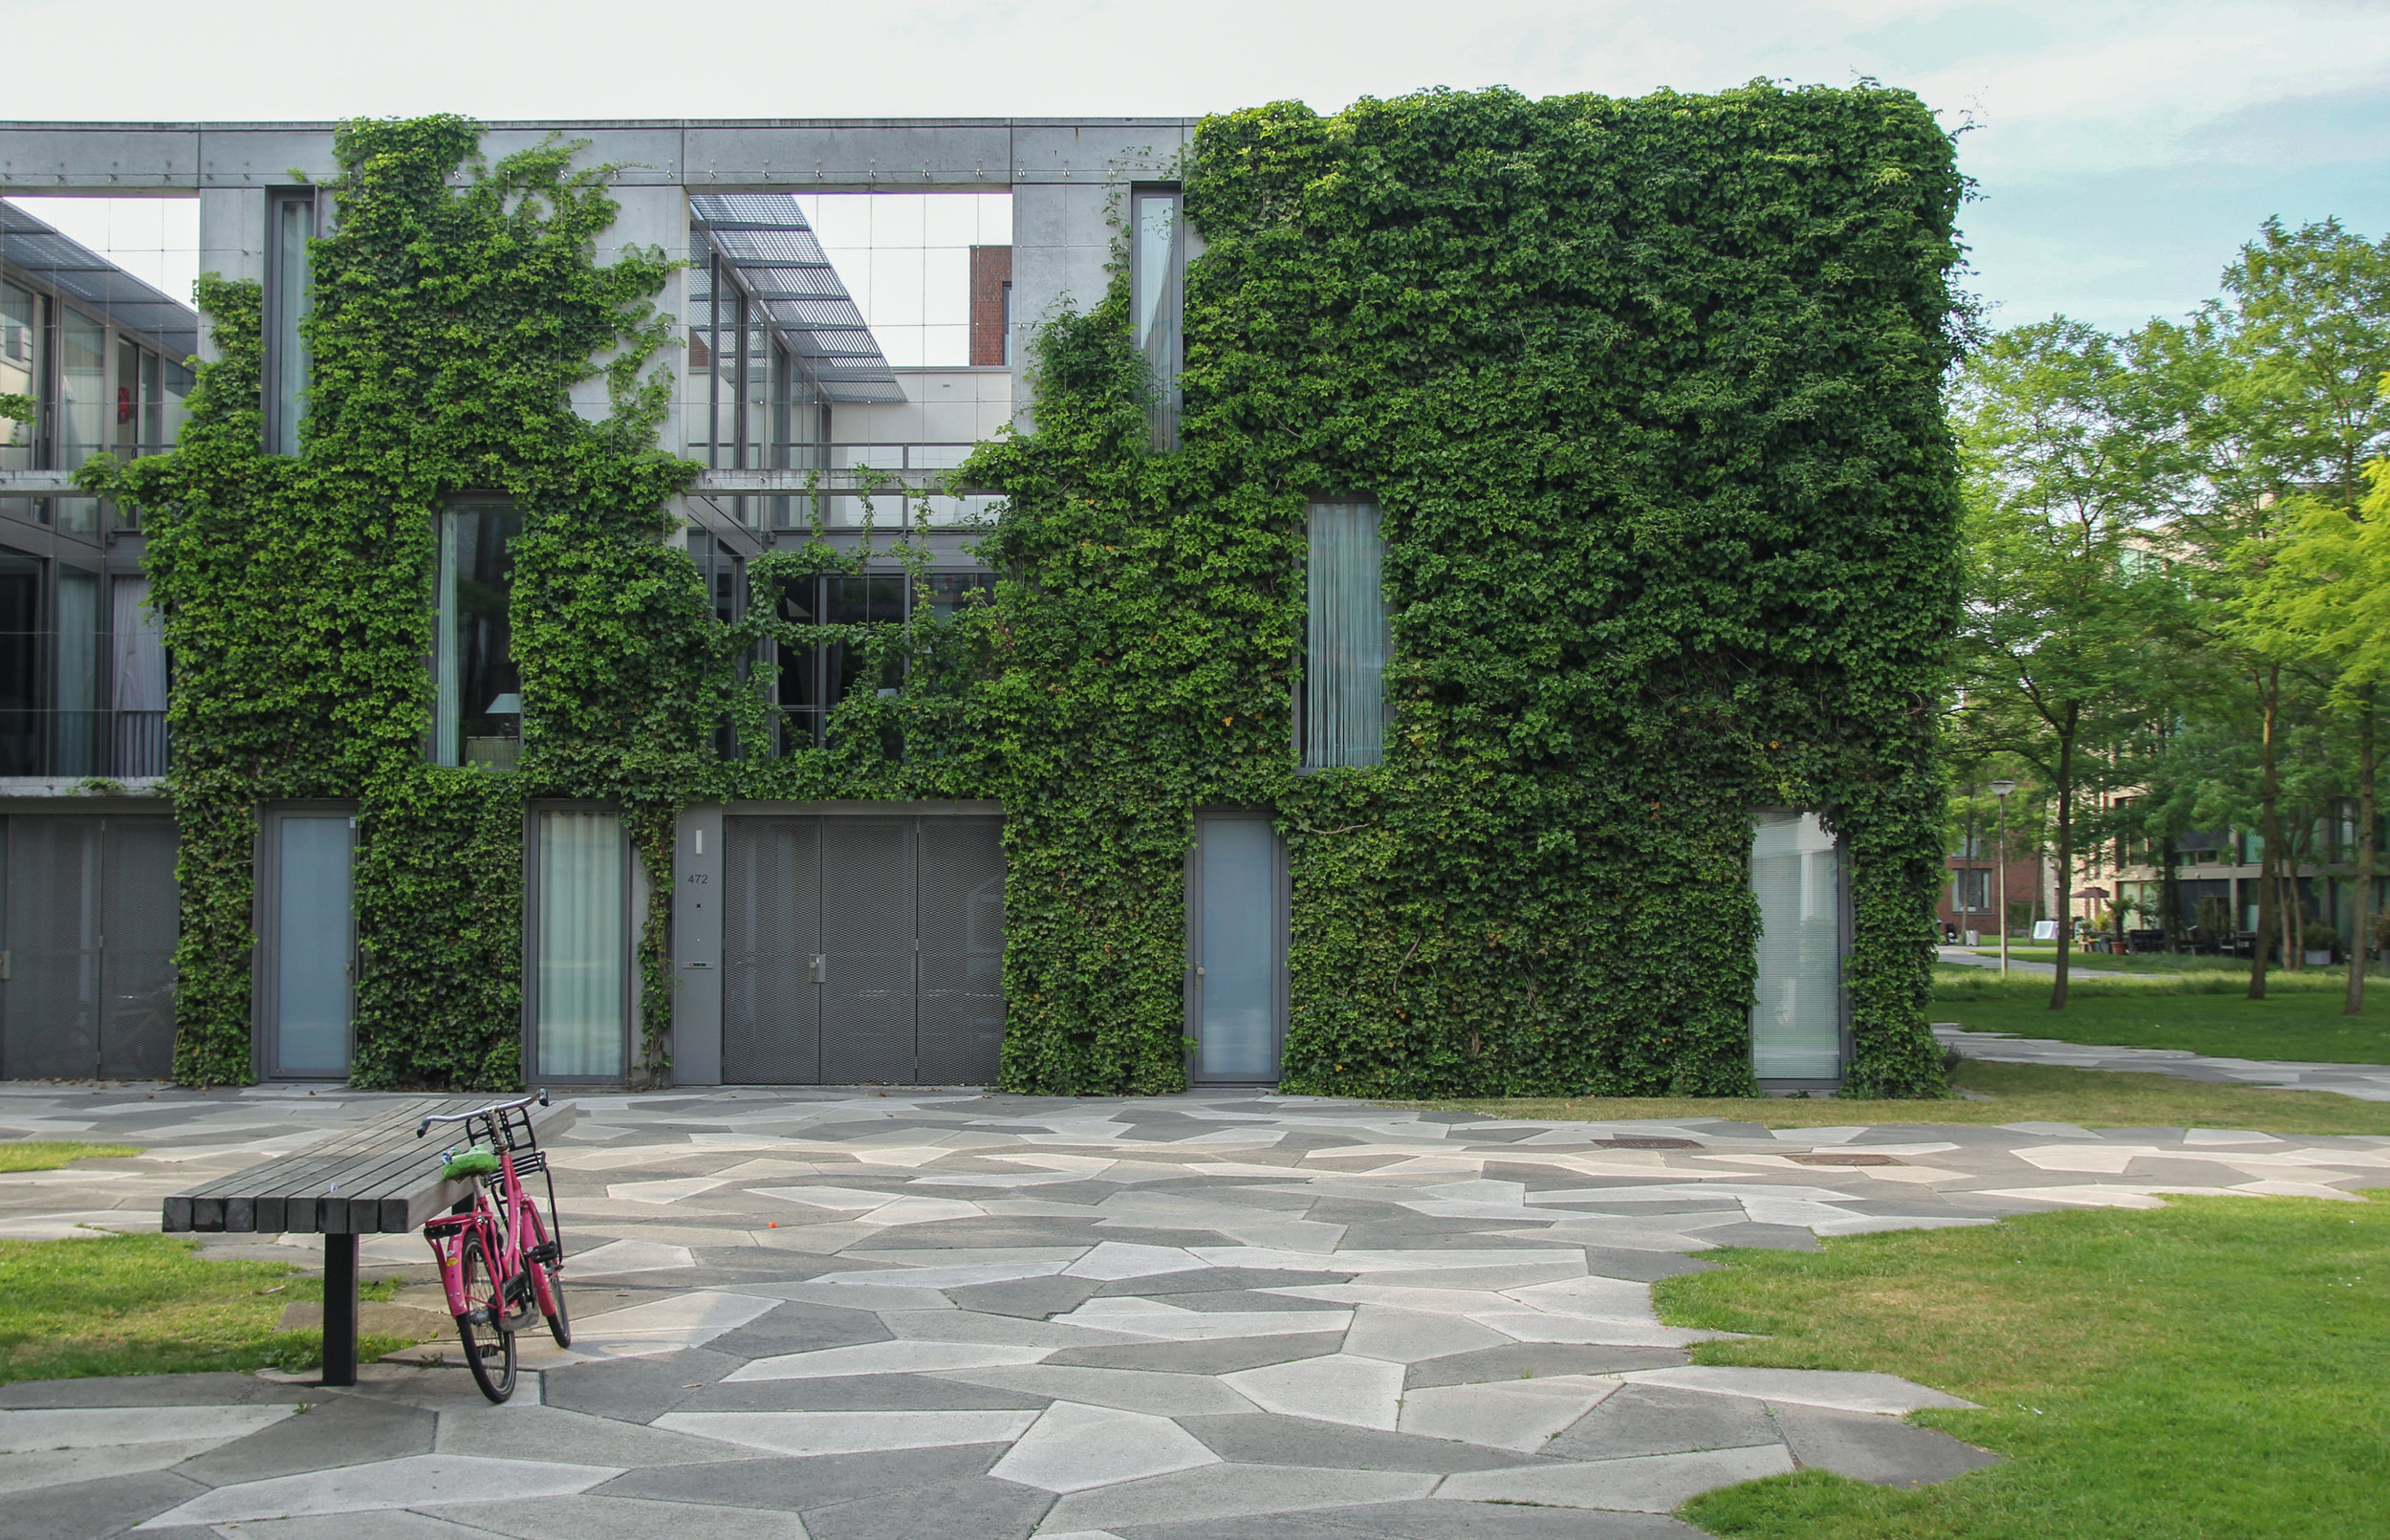 Amsterdam way of life / Mladen Jovanovic architectural photography